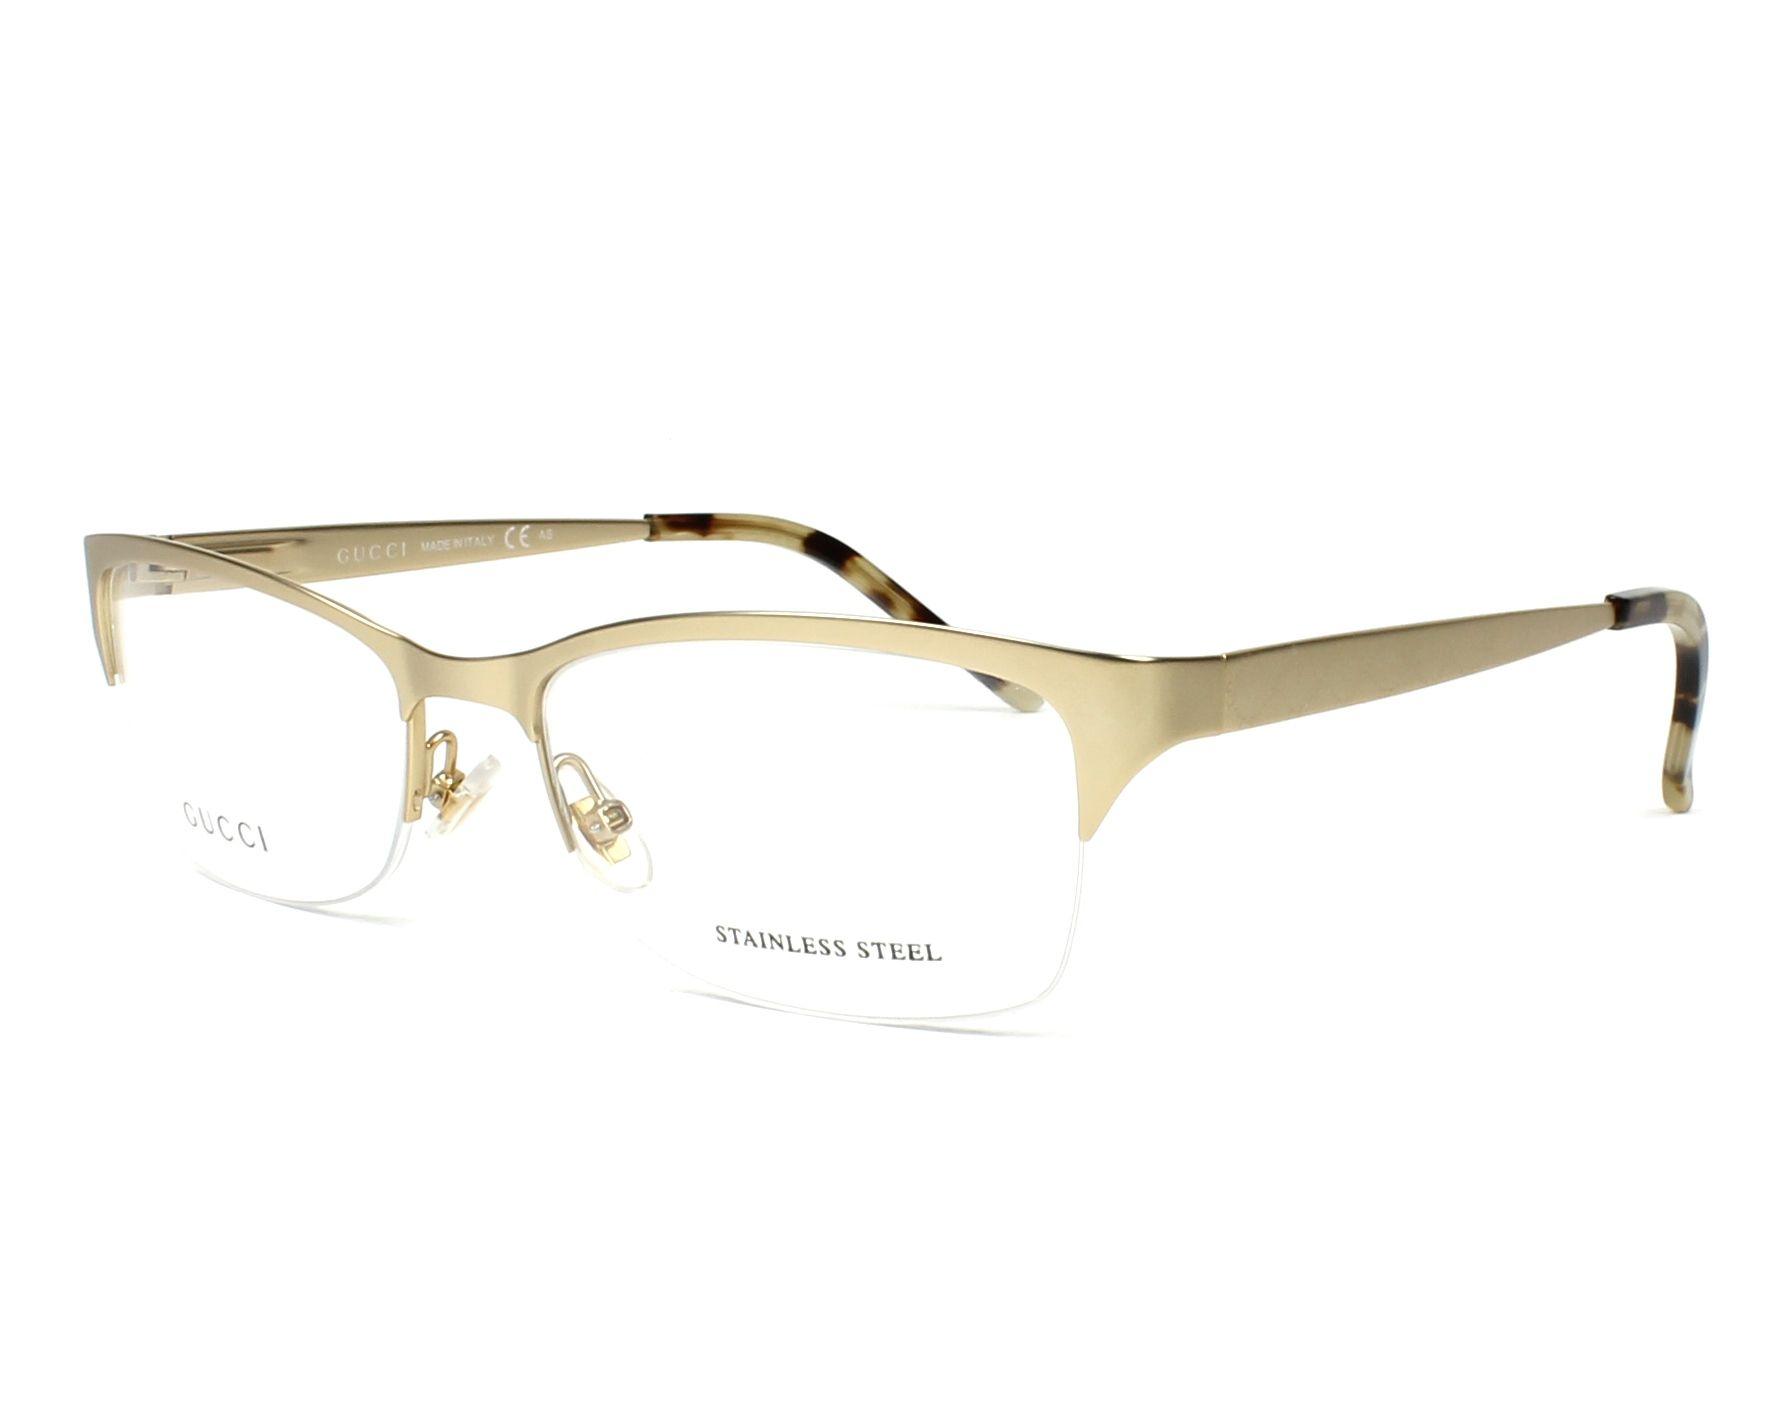 gucci - Womens Gucci Frames